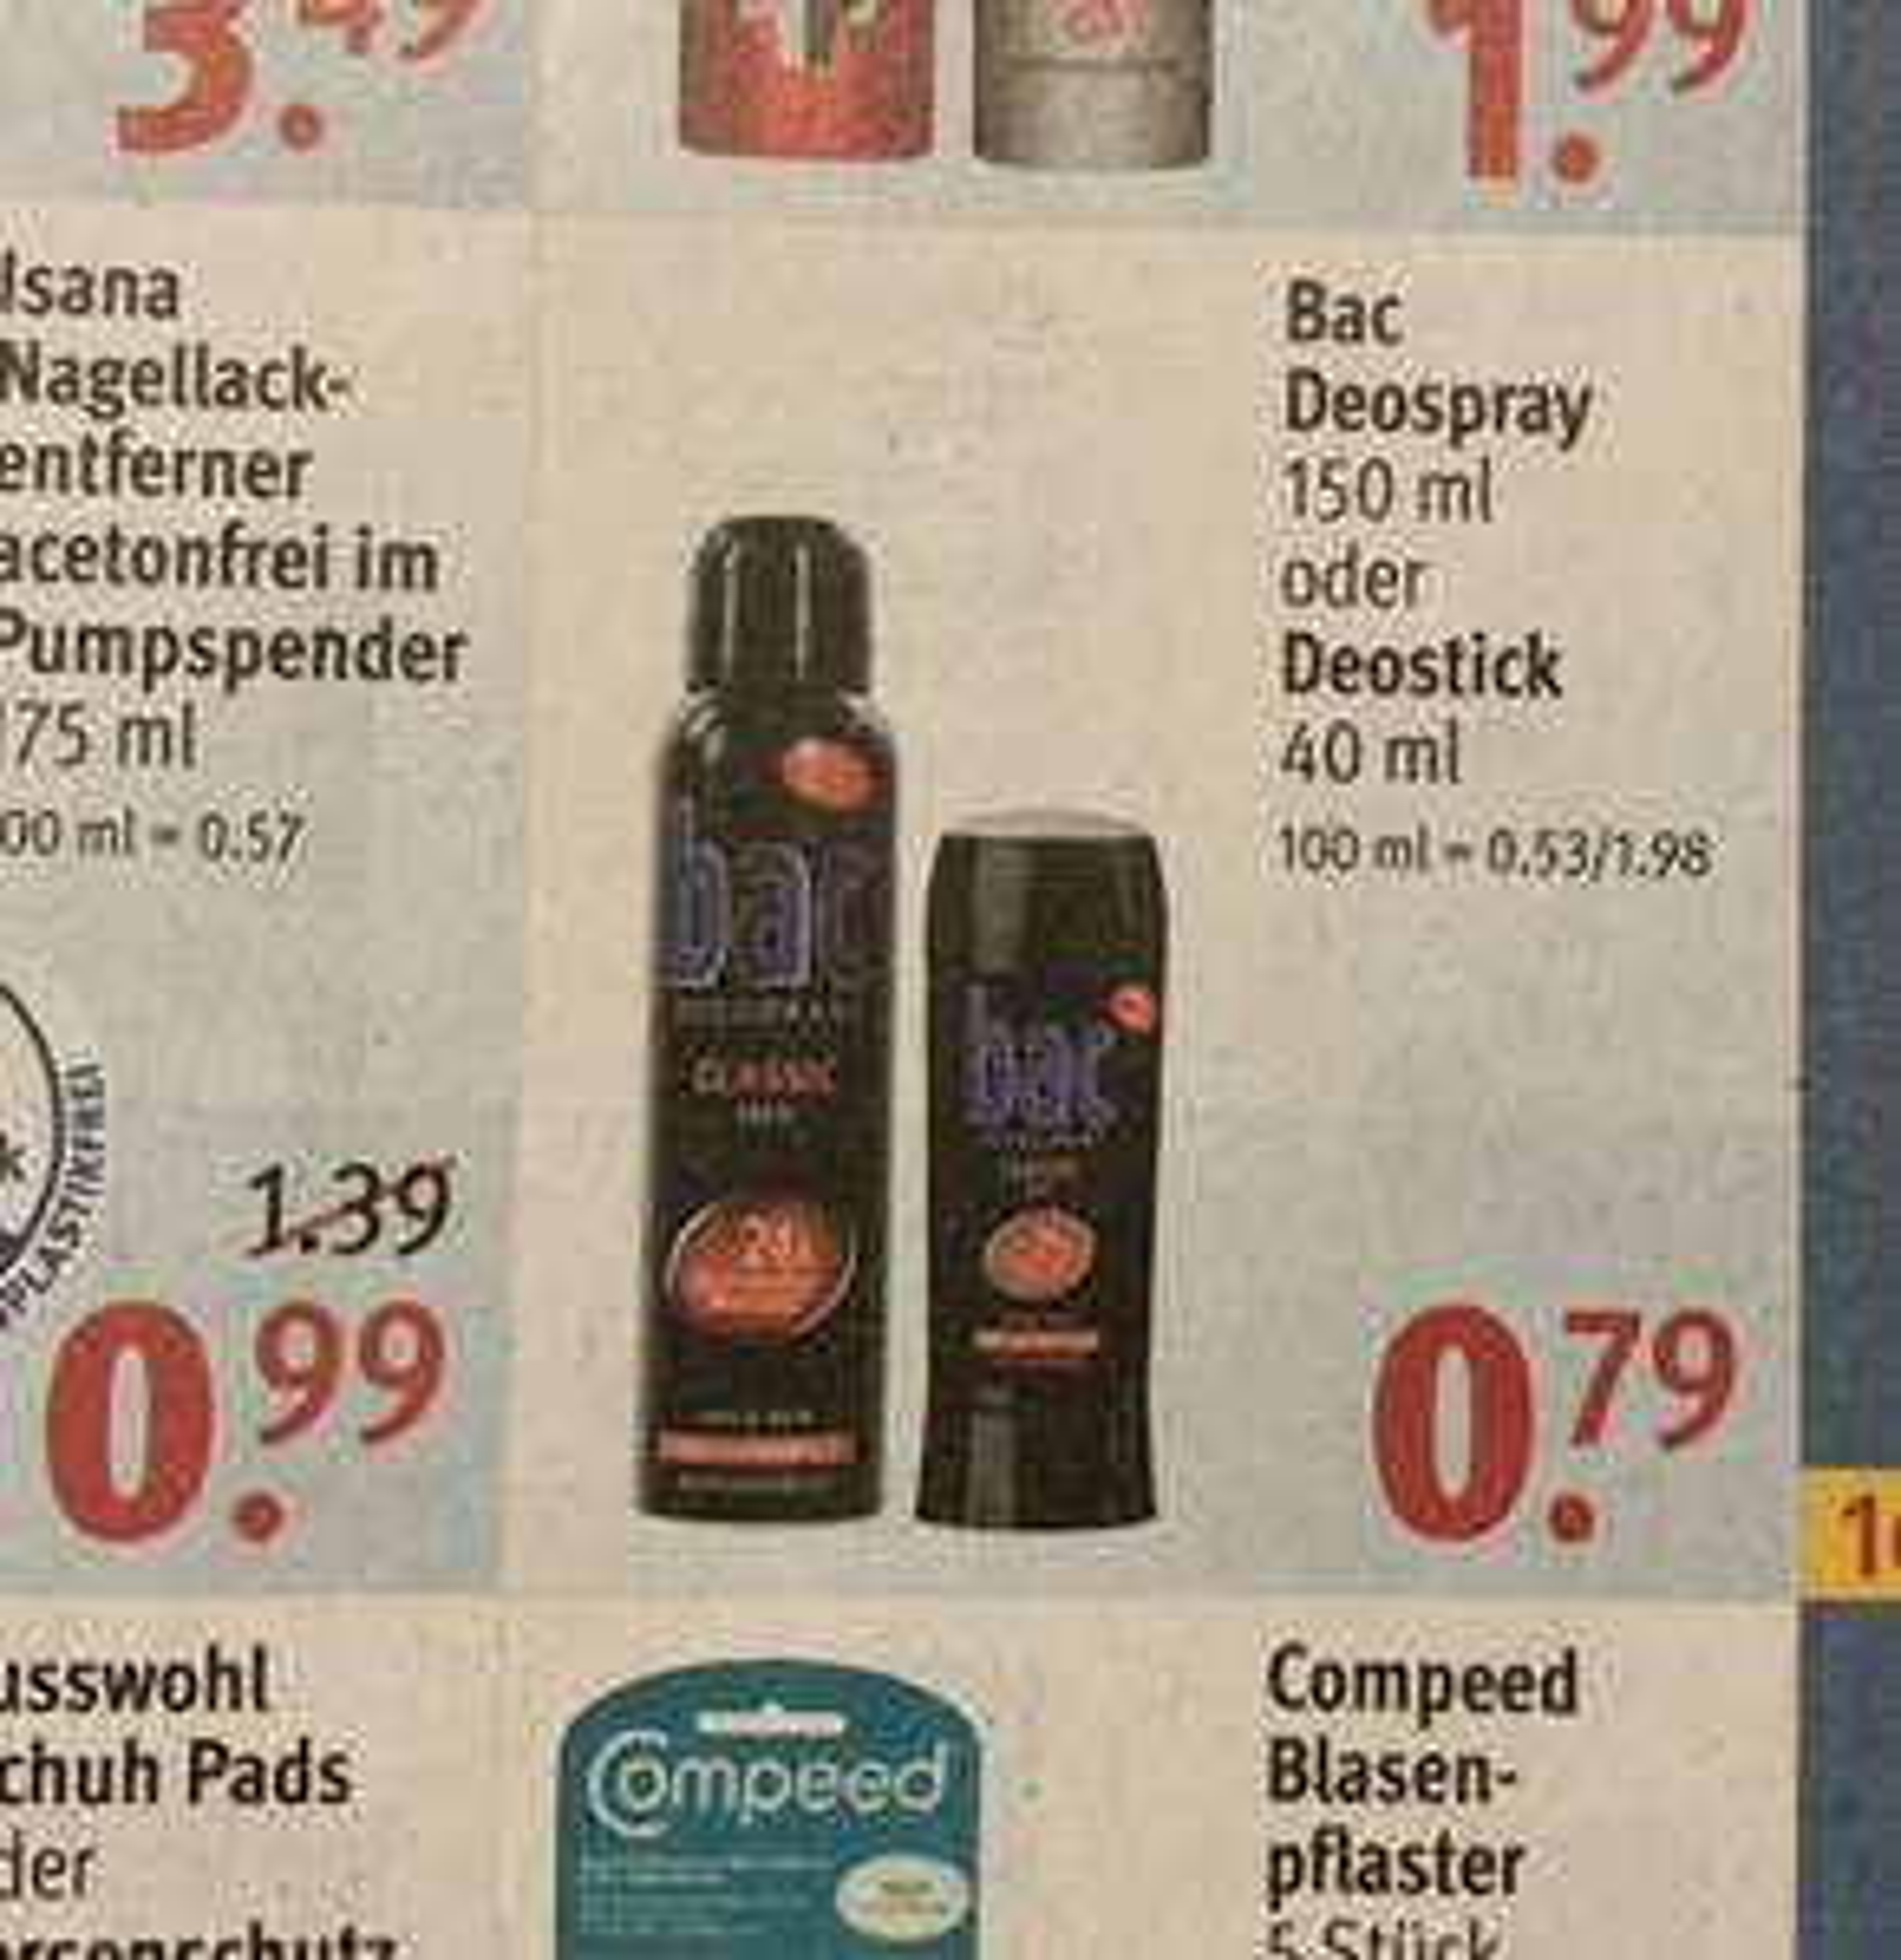 bac Deodorant / Deostick